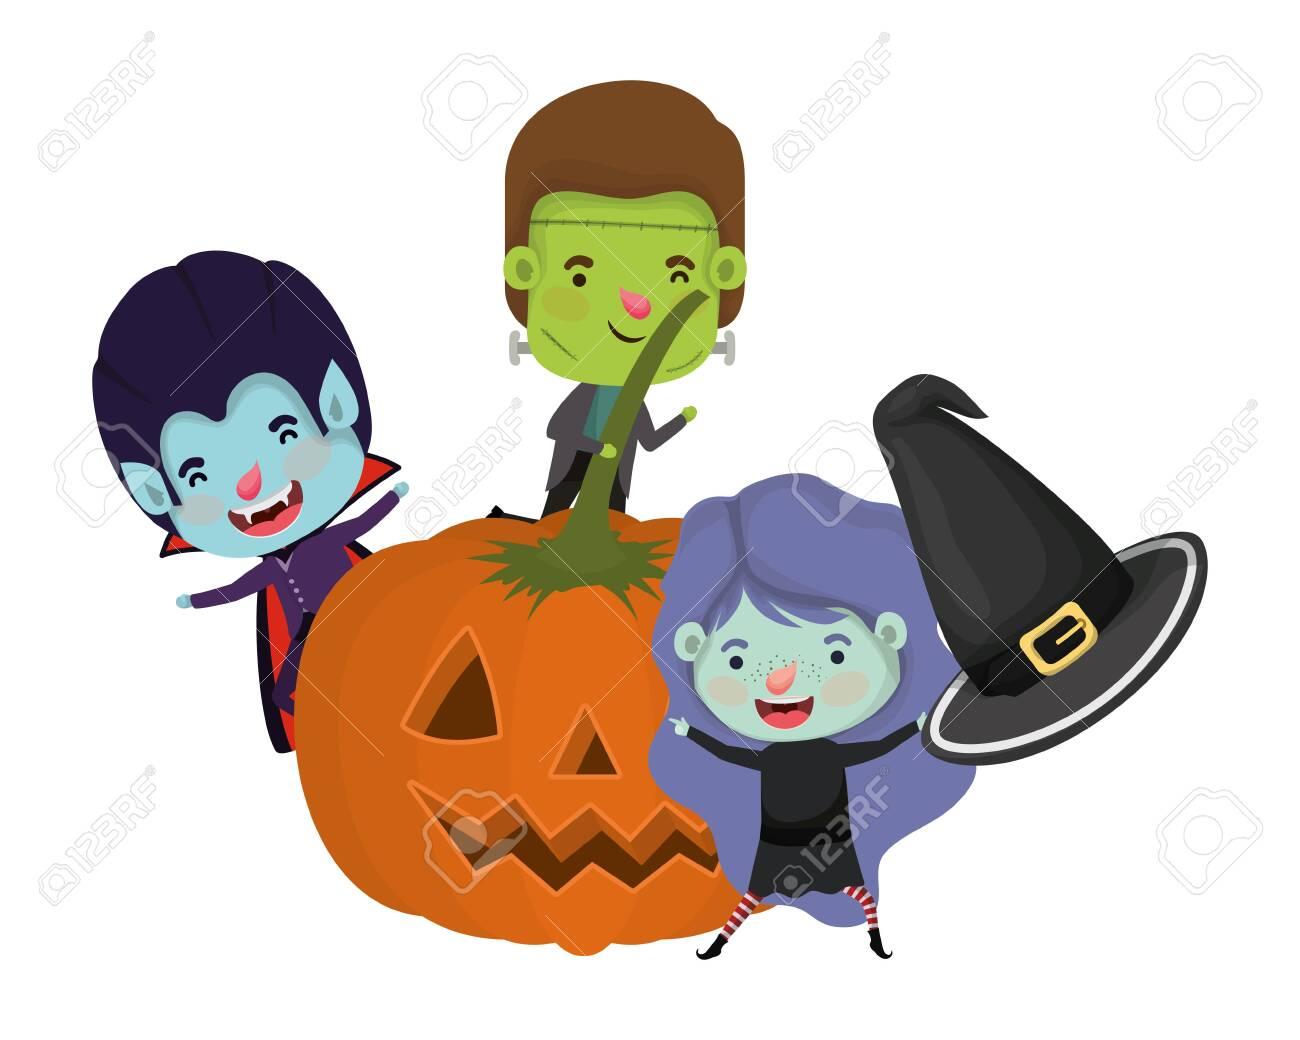 halloween pumpkin with kids costume characters vector illustration design - 133896914